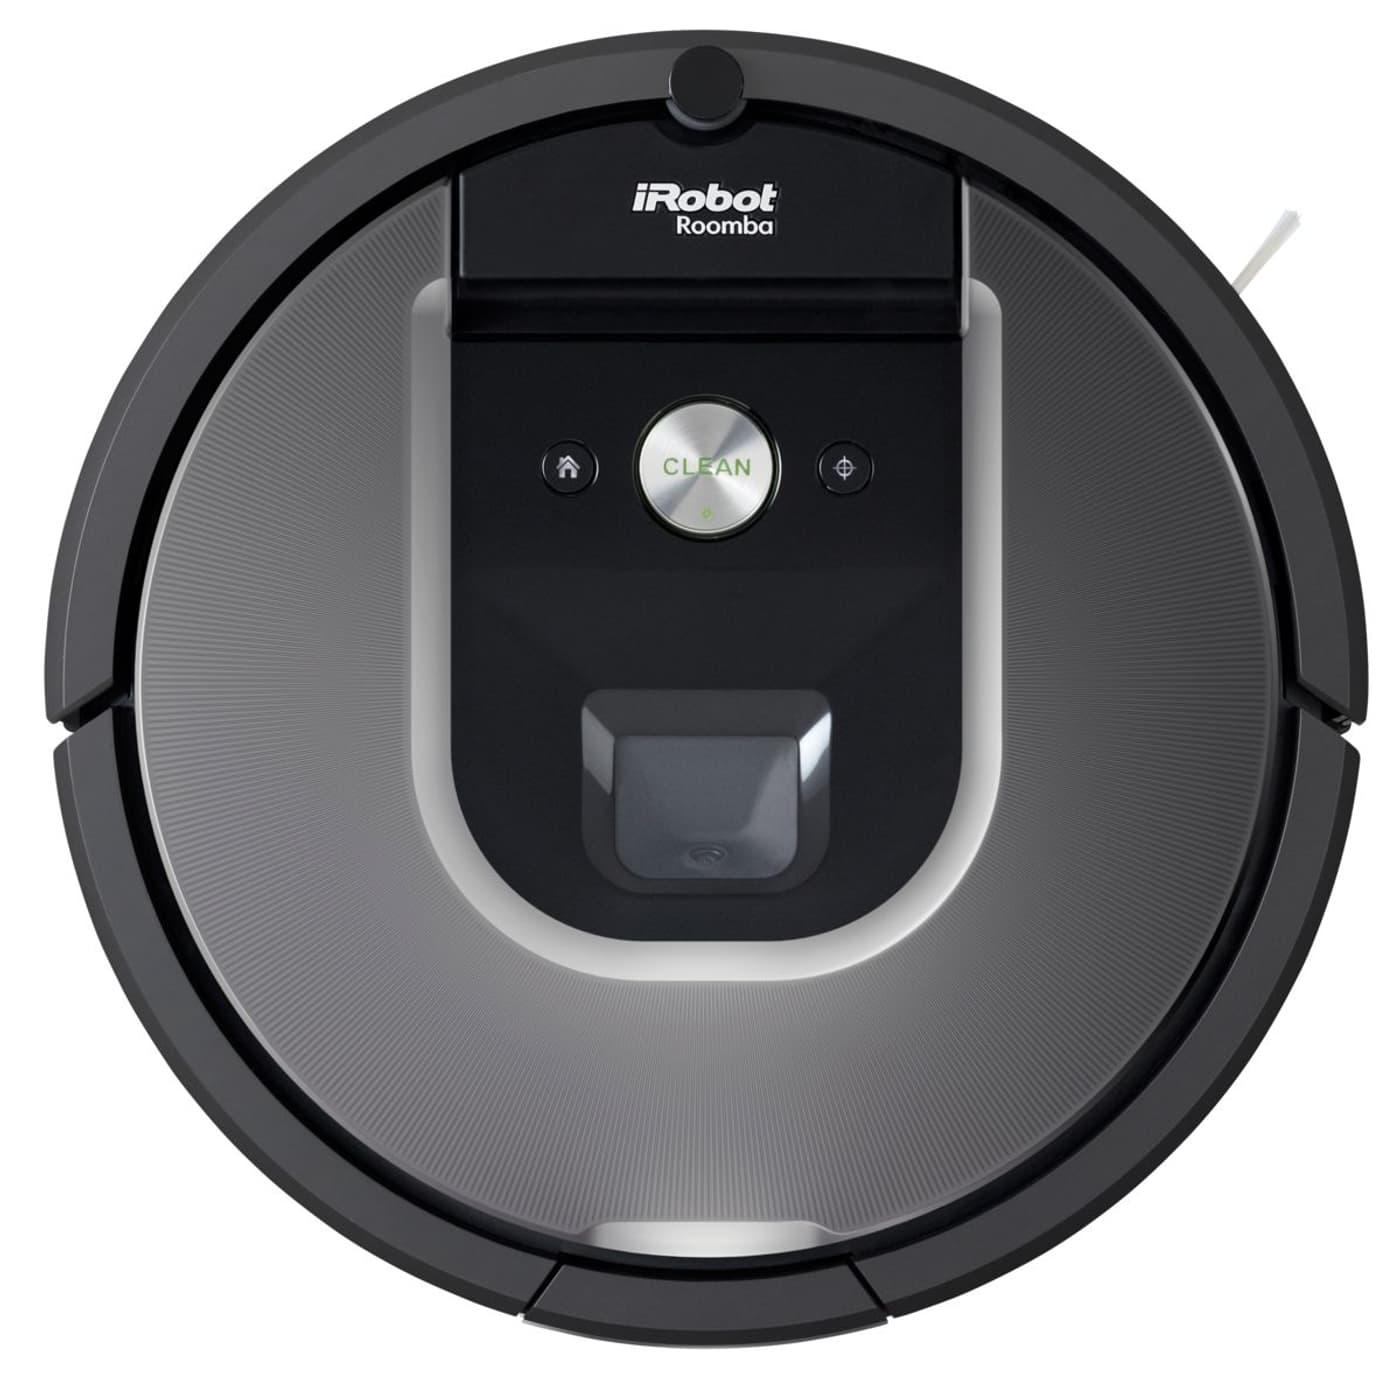 irobot roomba 960 aspirateur robot migros. Black Bedroom Furniture Sets. Home Design Ideas